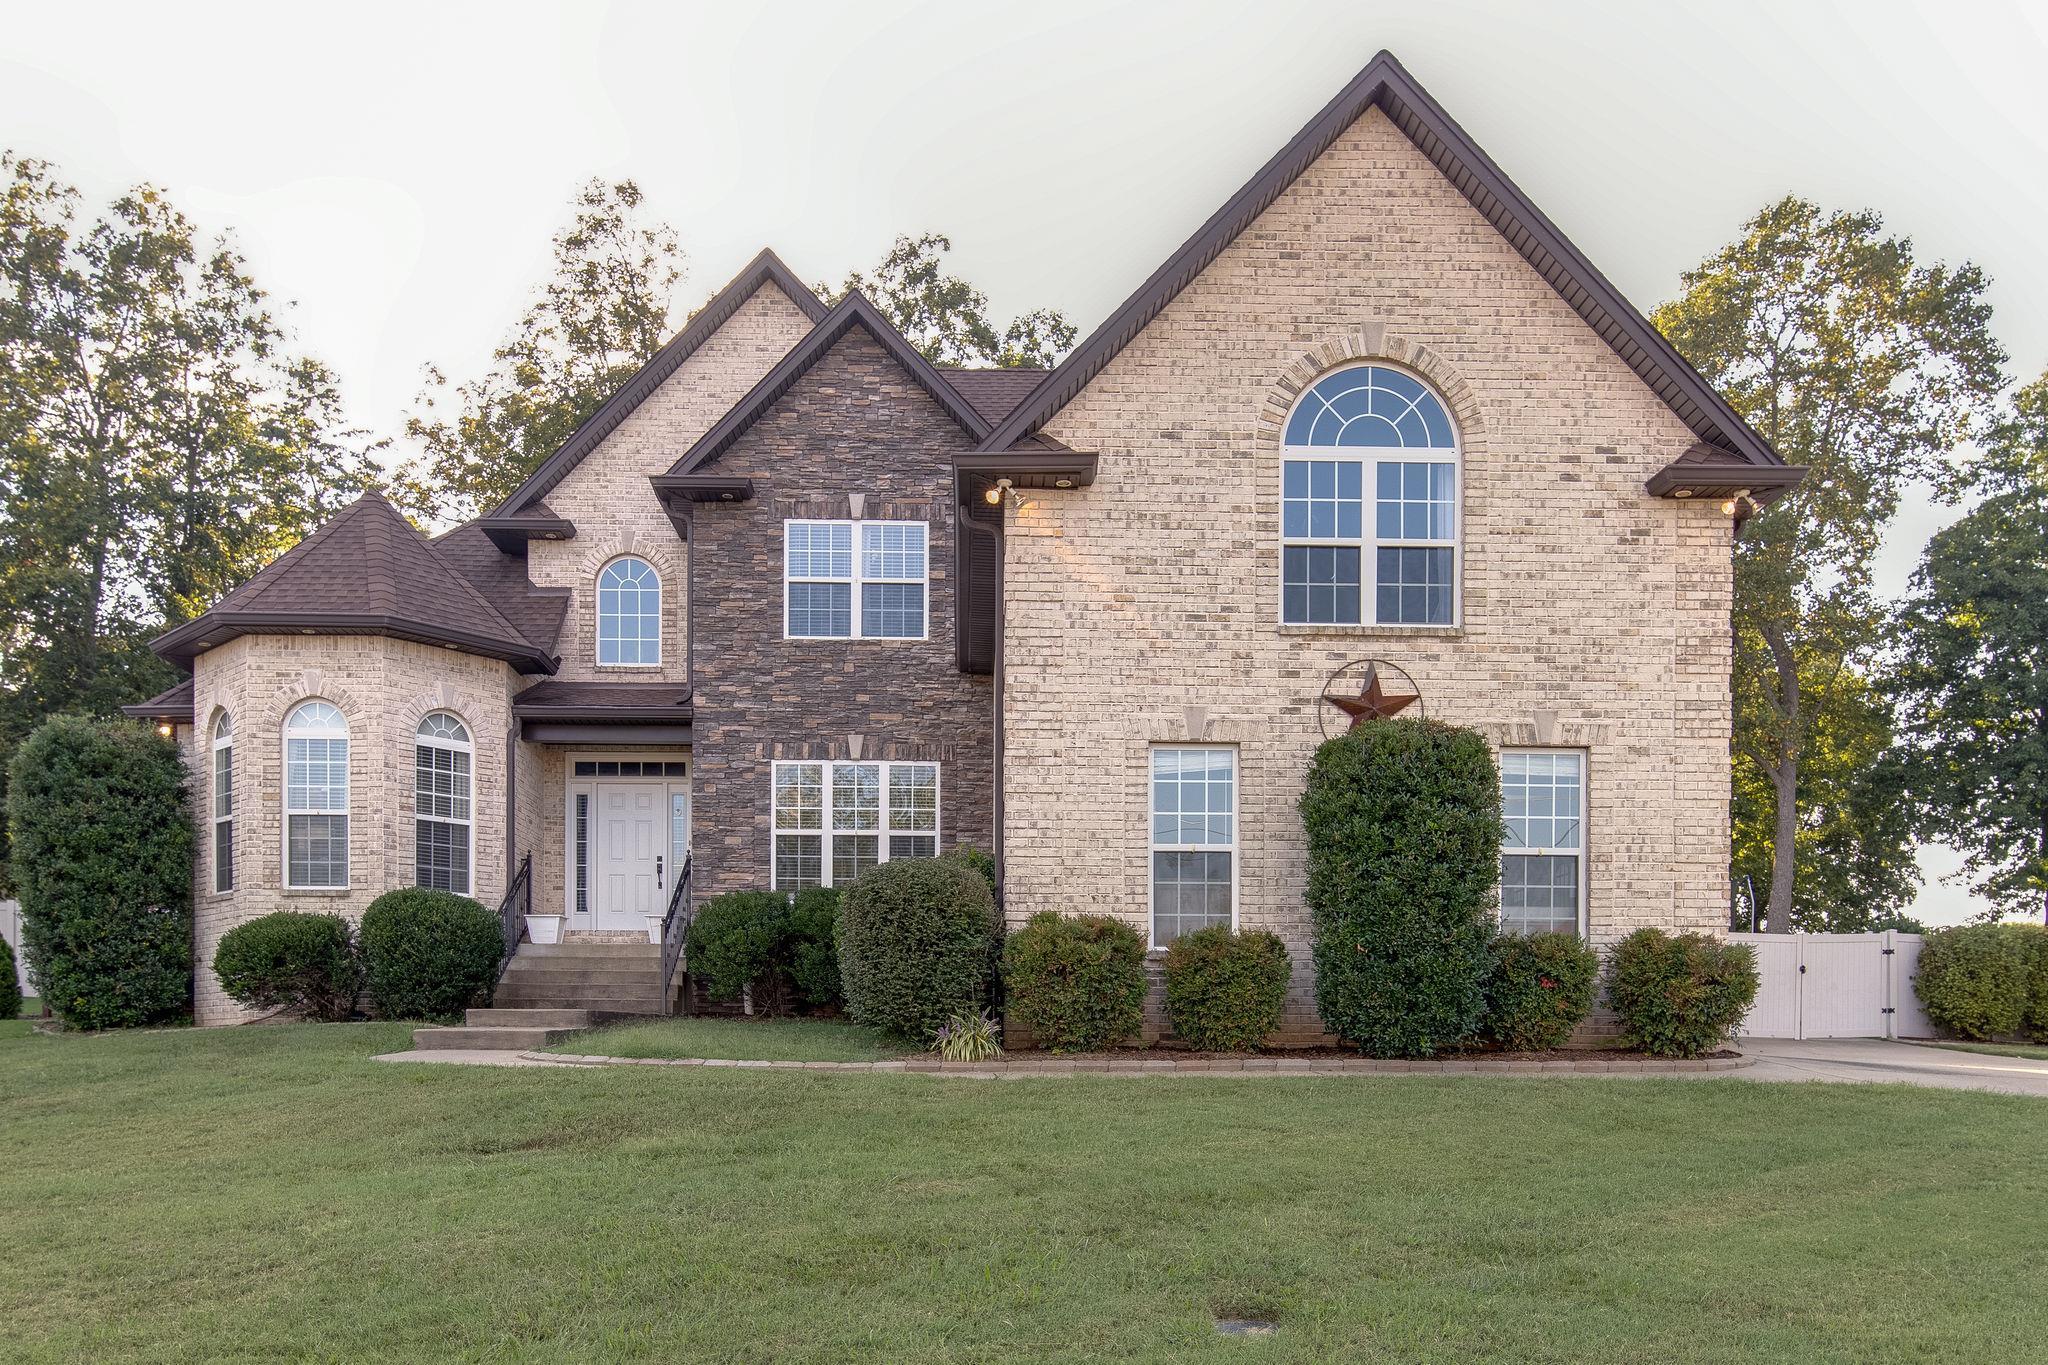 1086 Carrs Creek Blvd, Greenbrier, TN 37073 - Greenbrier, TN real estate listing